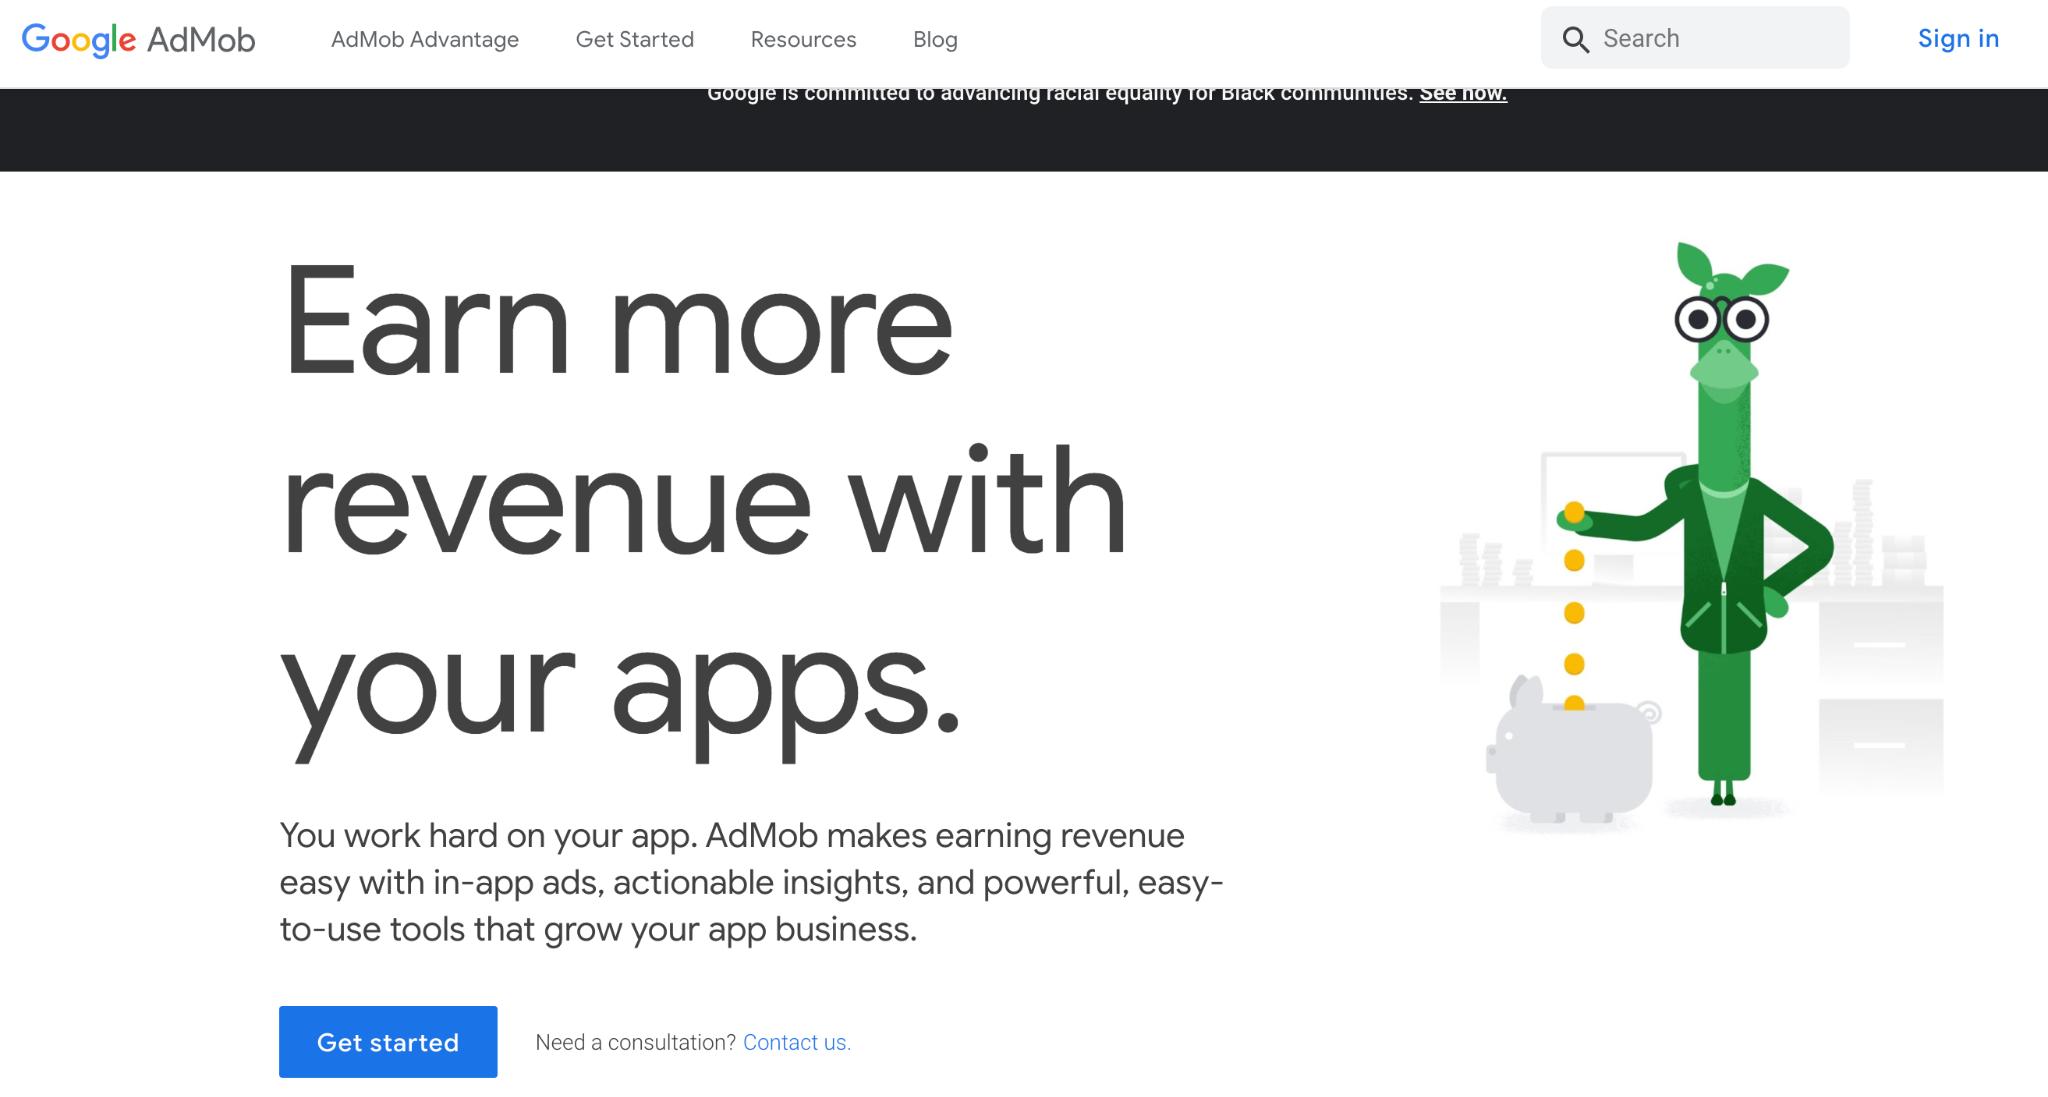 Google AdMob Homepage